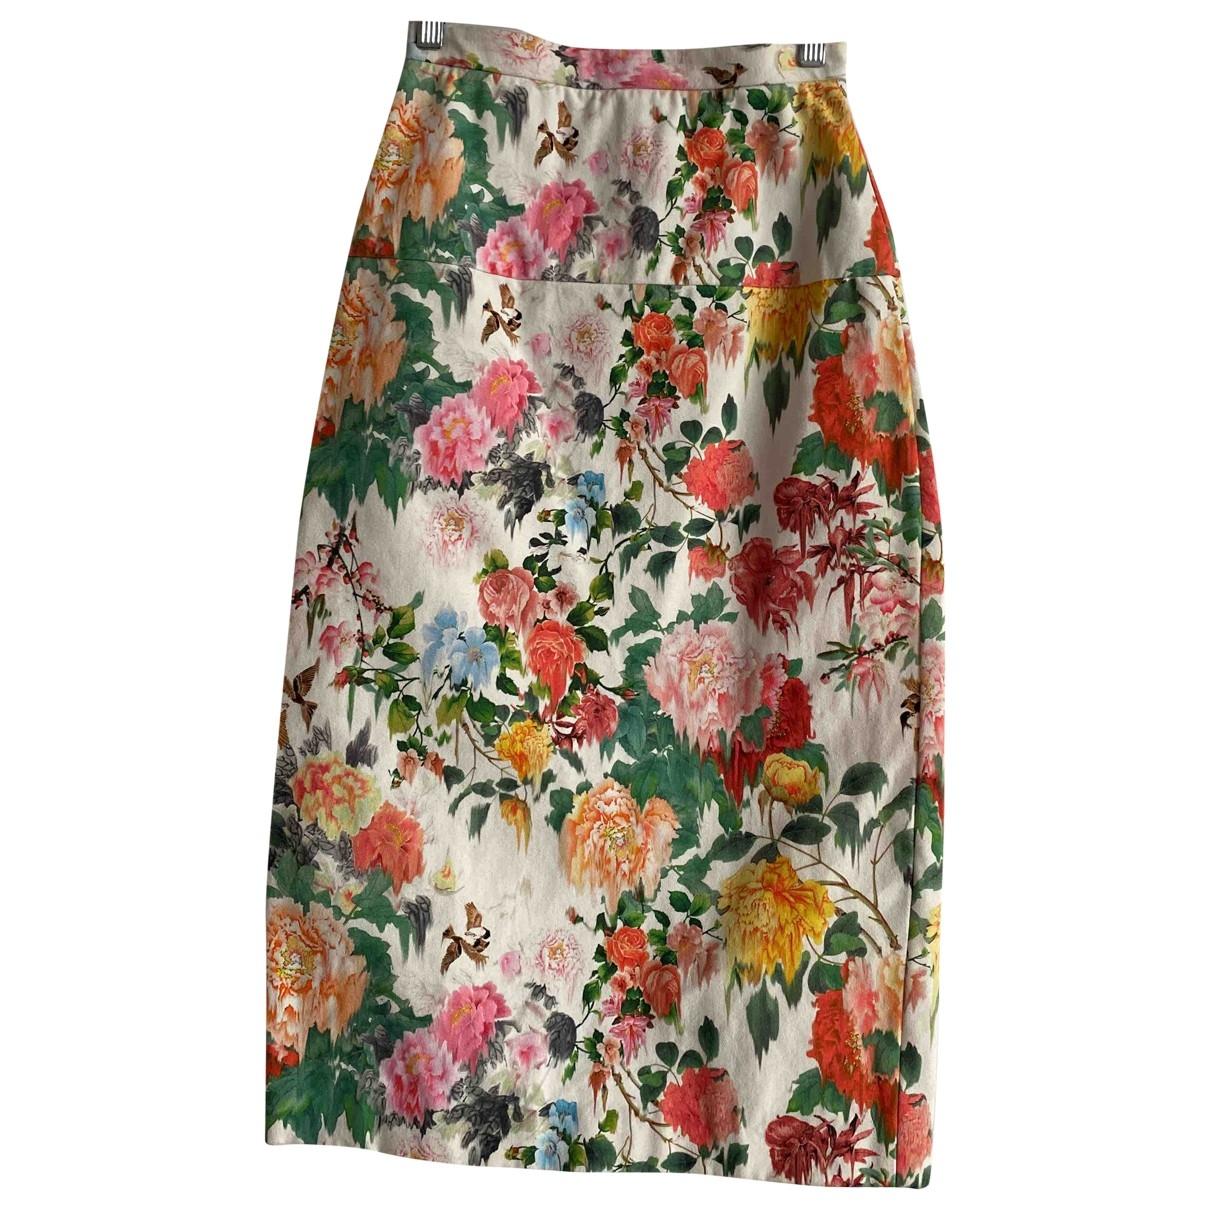 Eudon Choi \N Red skirt for Women 42 IT